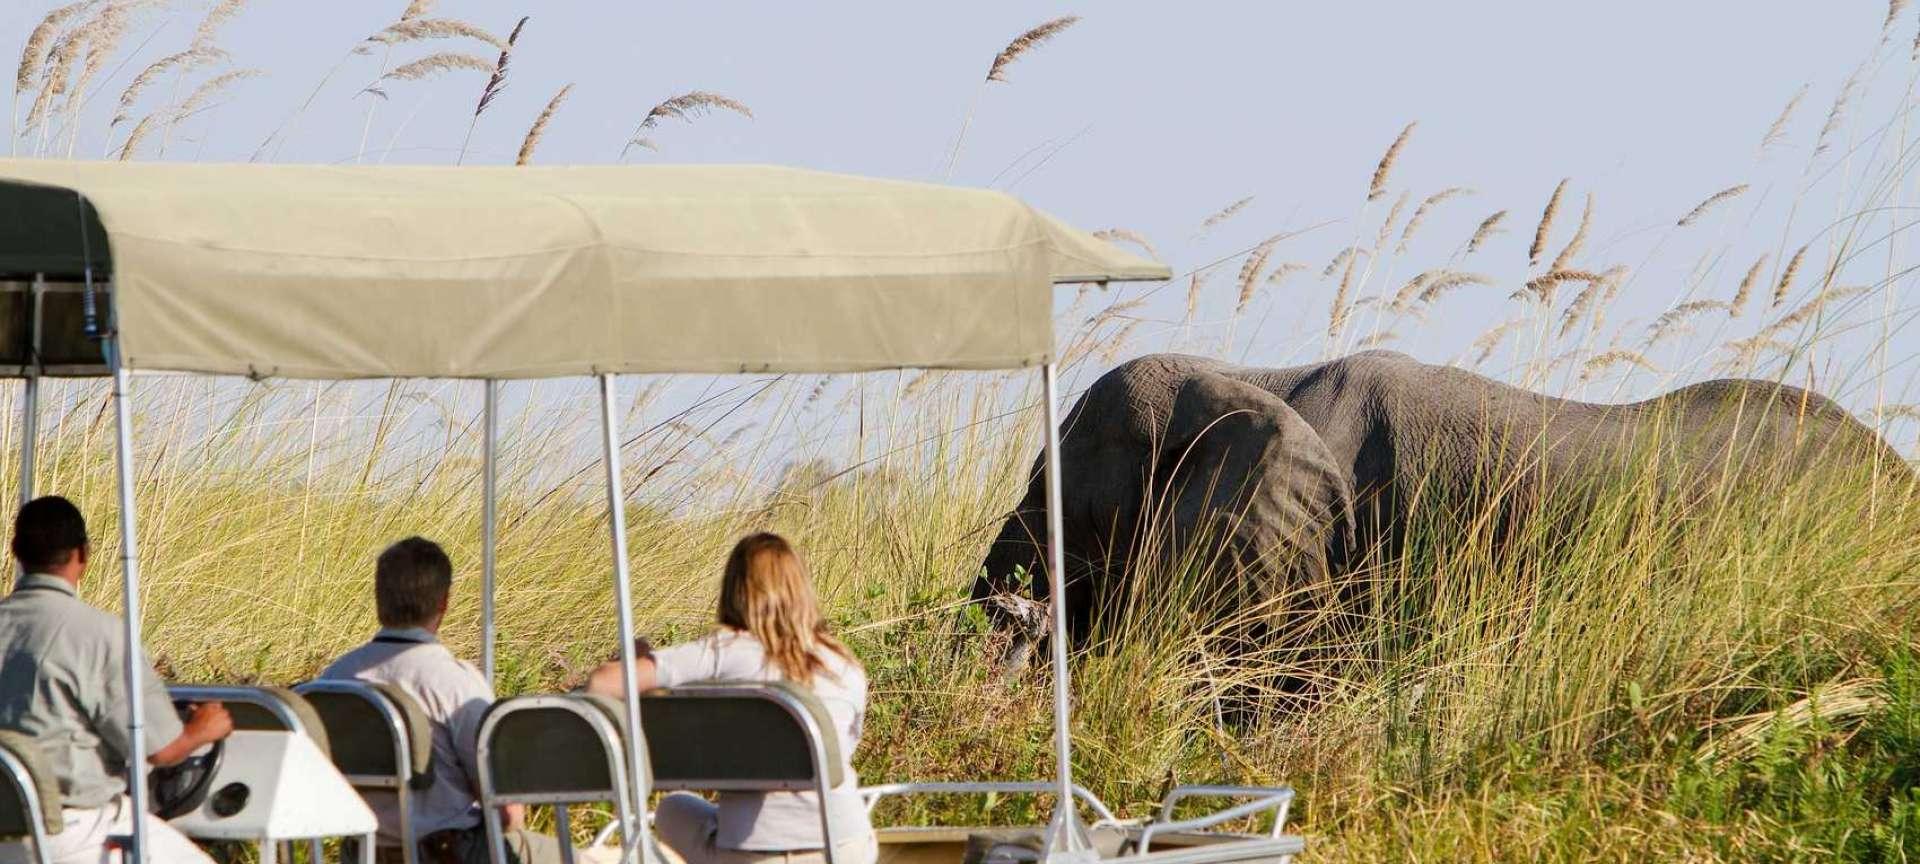 Northern Botswana - Africa Wildlife Safaris